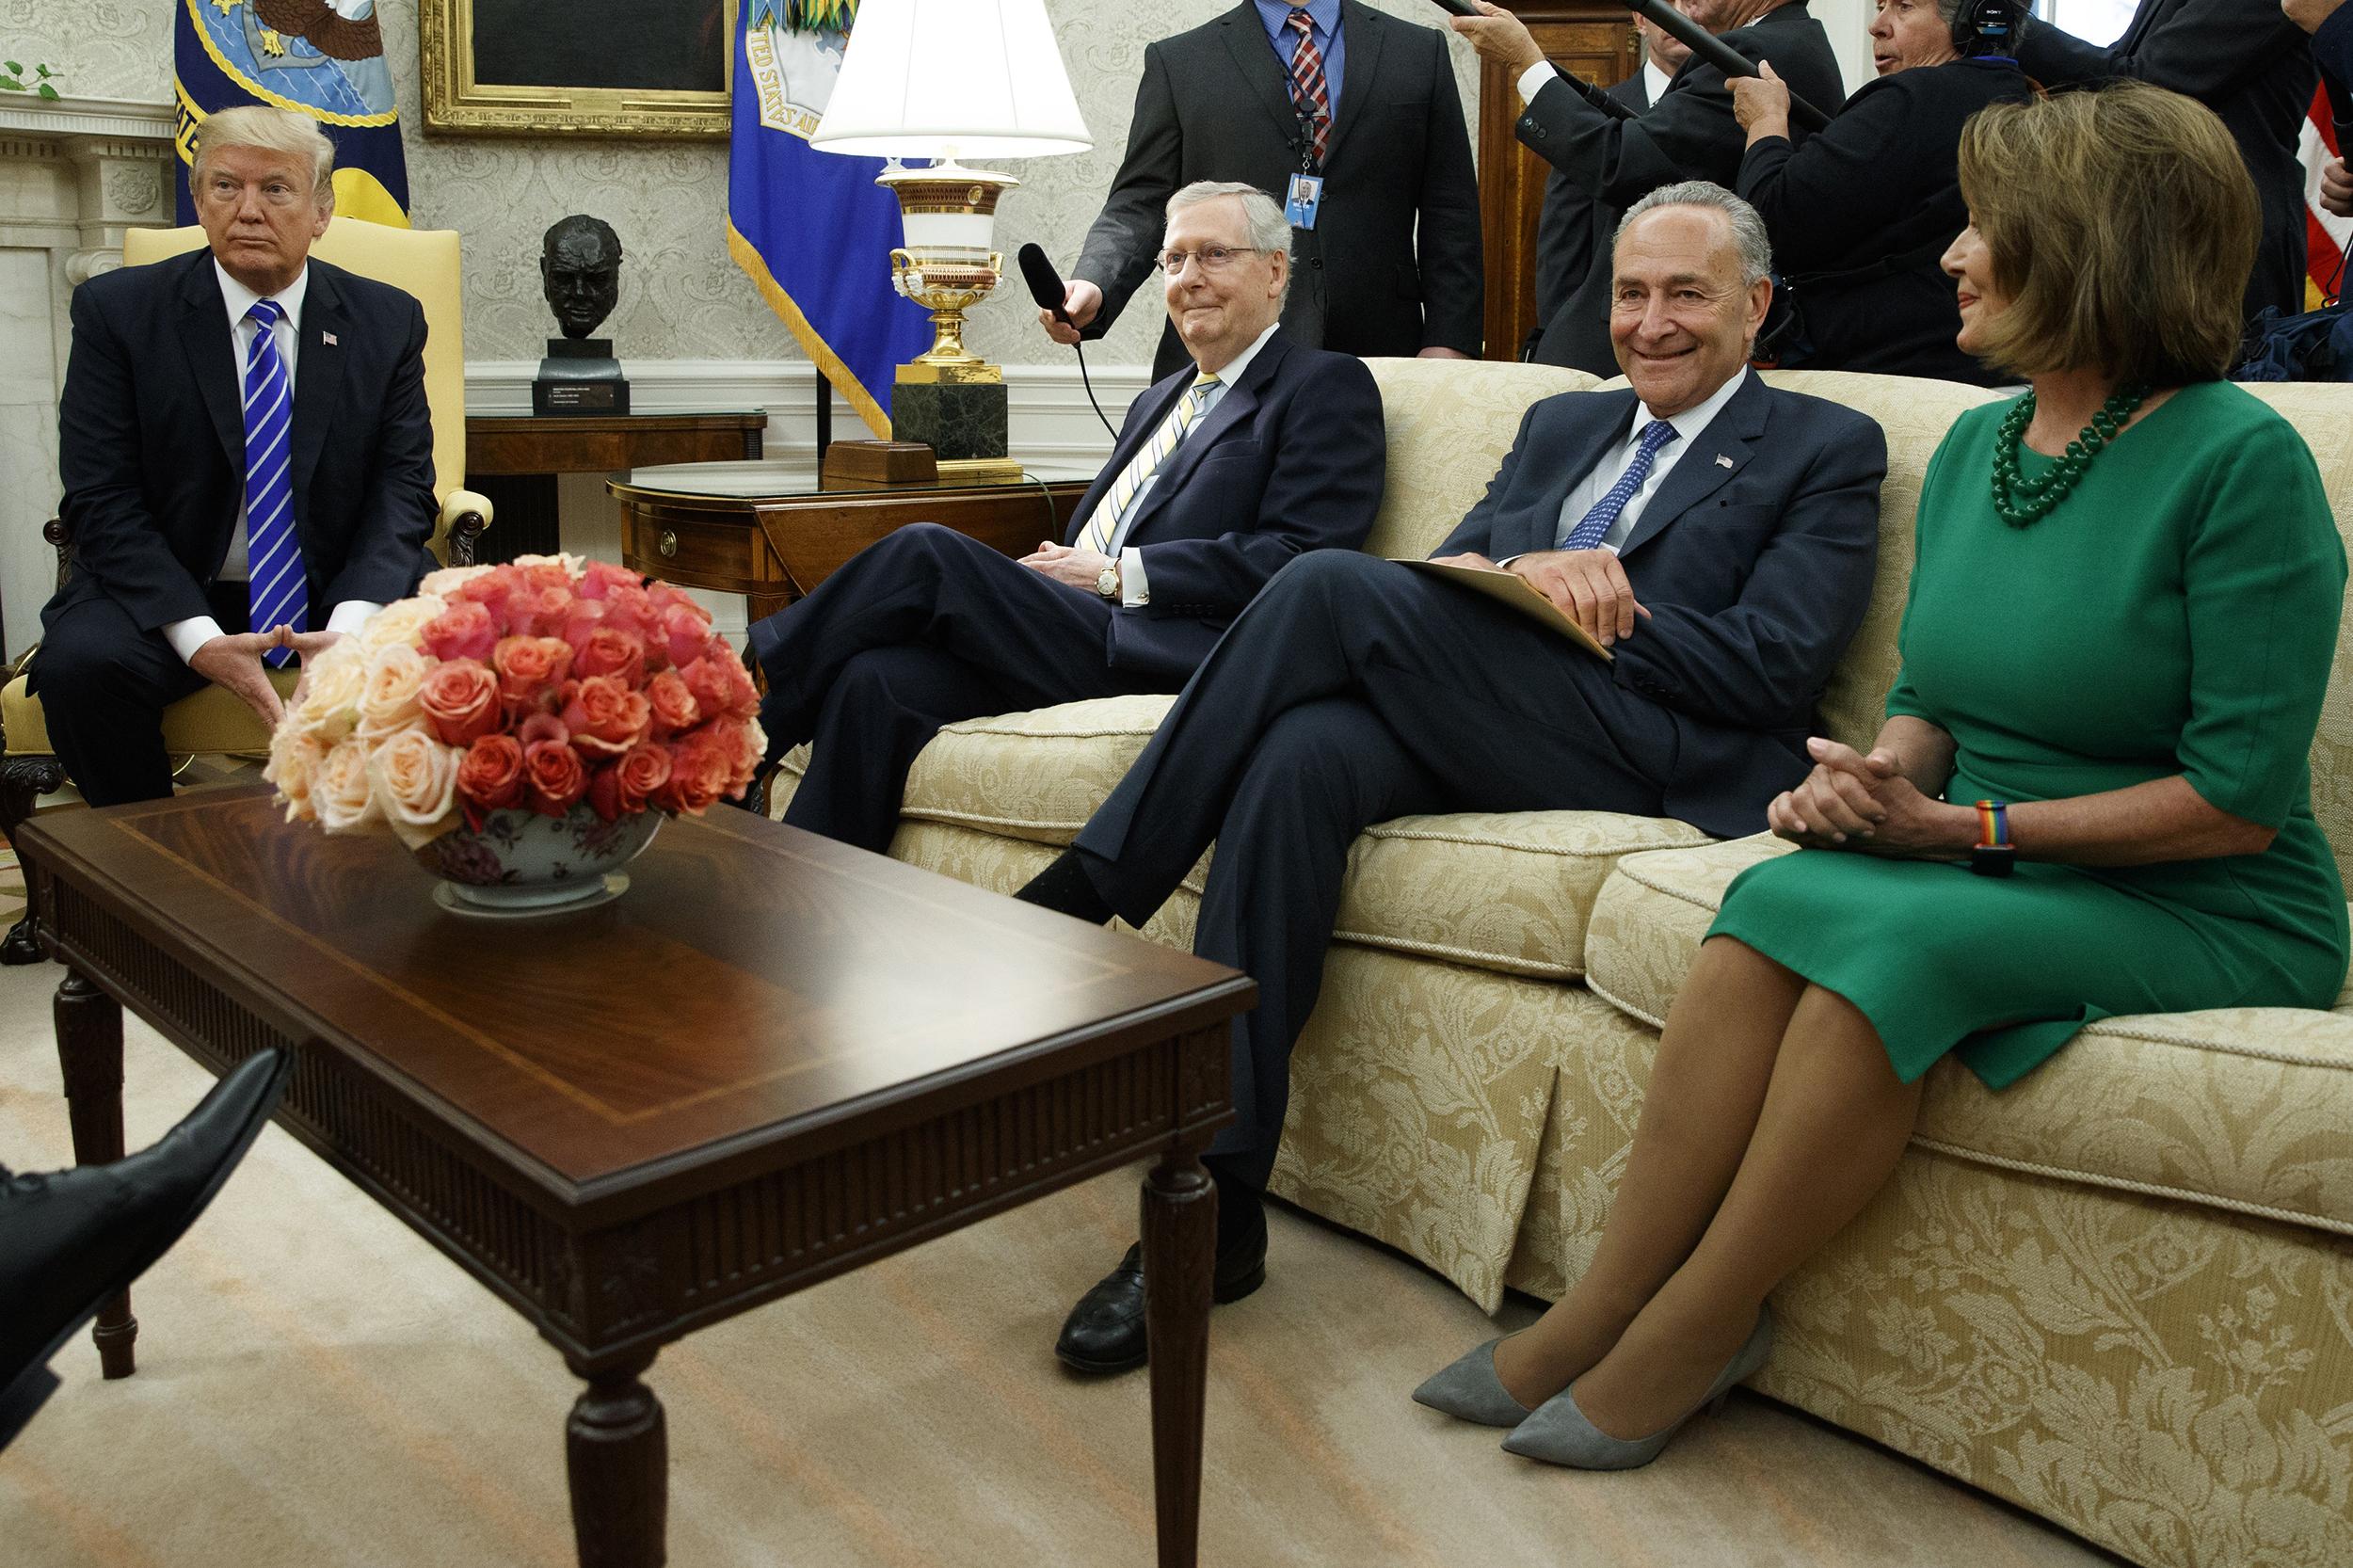 Image: Donald Trump, Chuck Schumer, Mitch McConnell, Nancy Pelosi